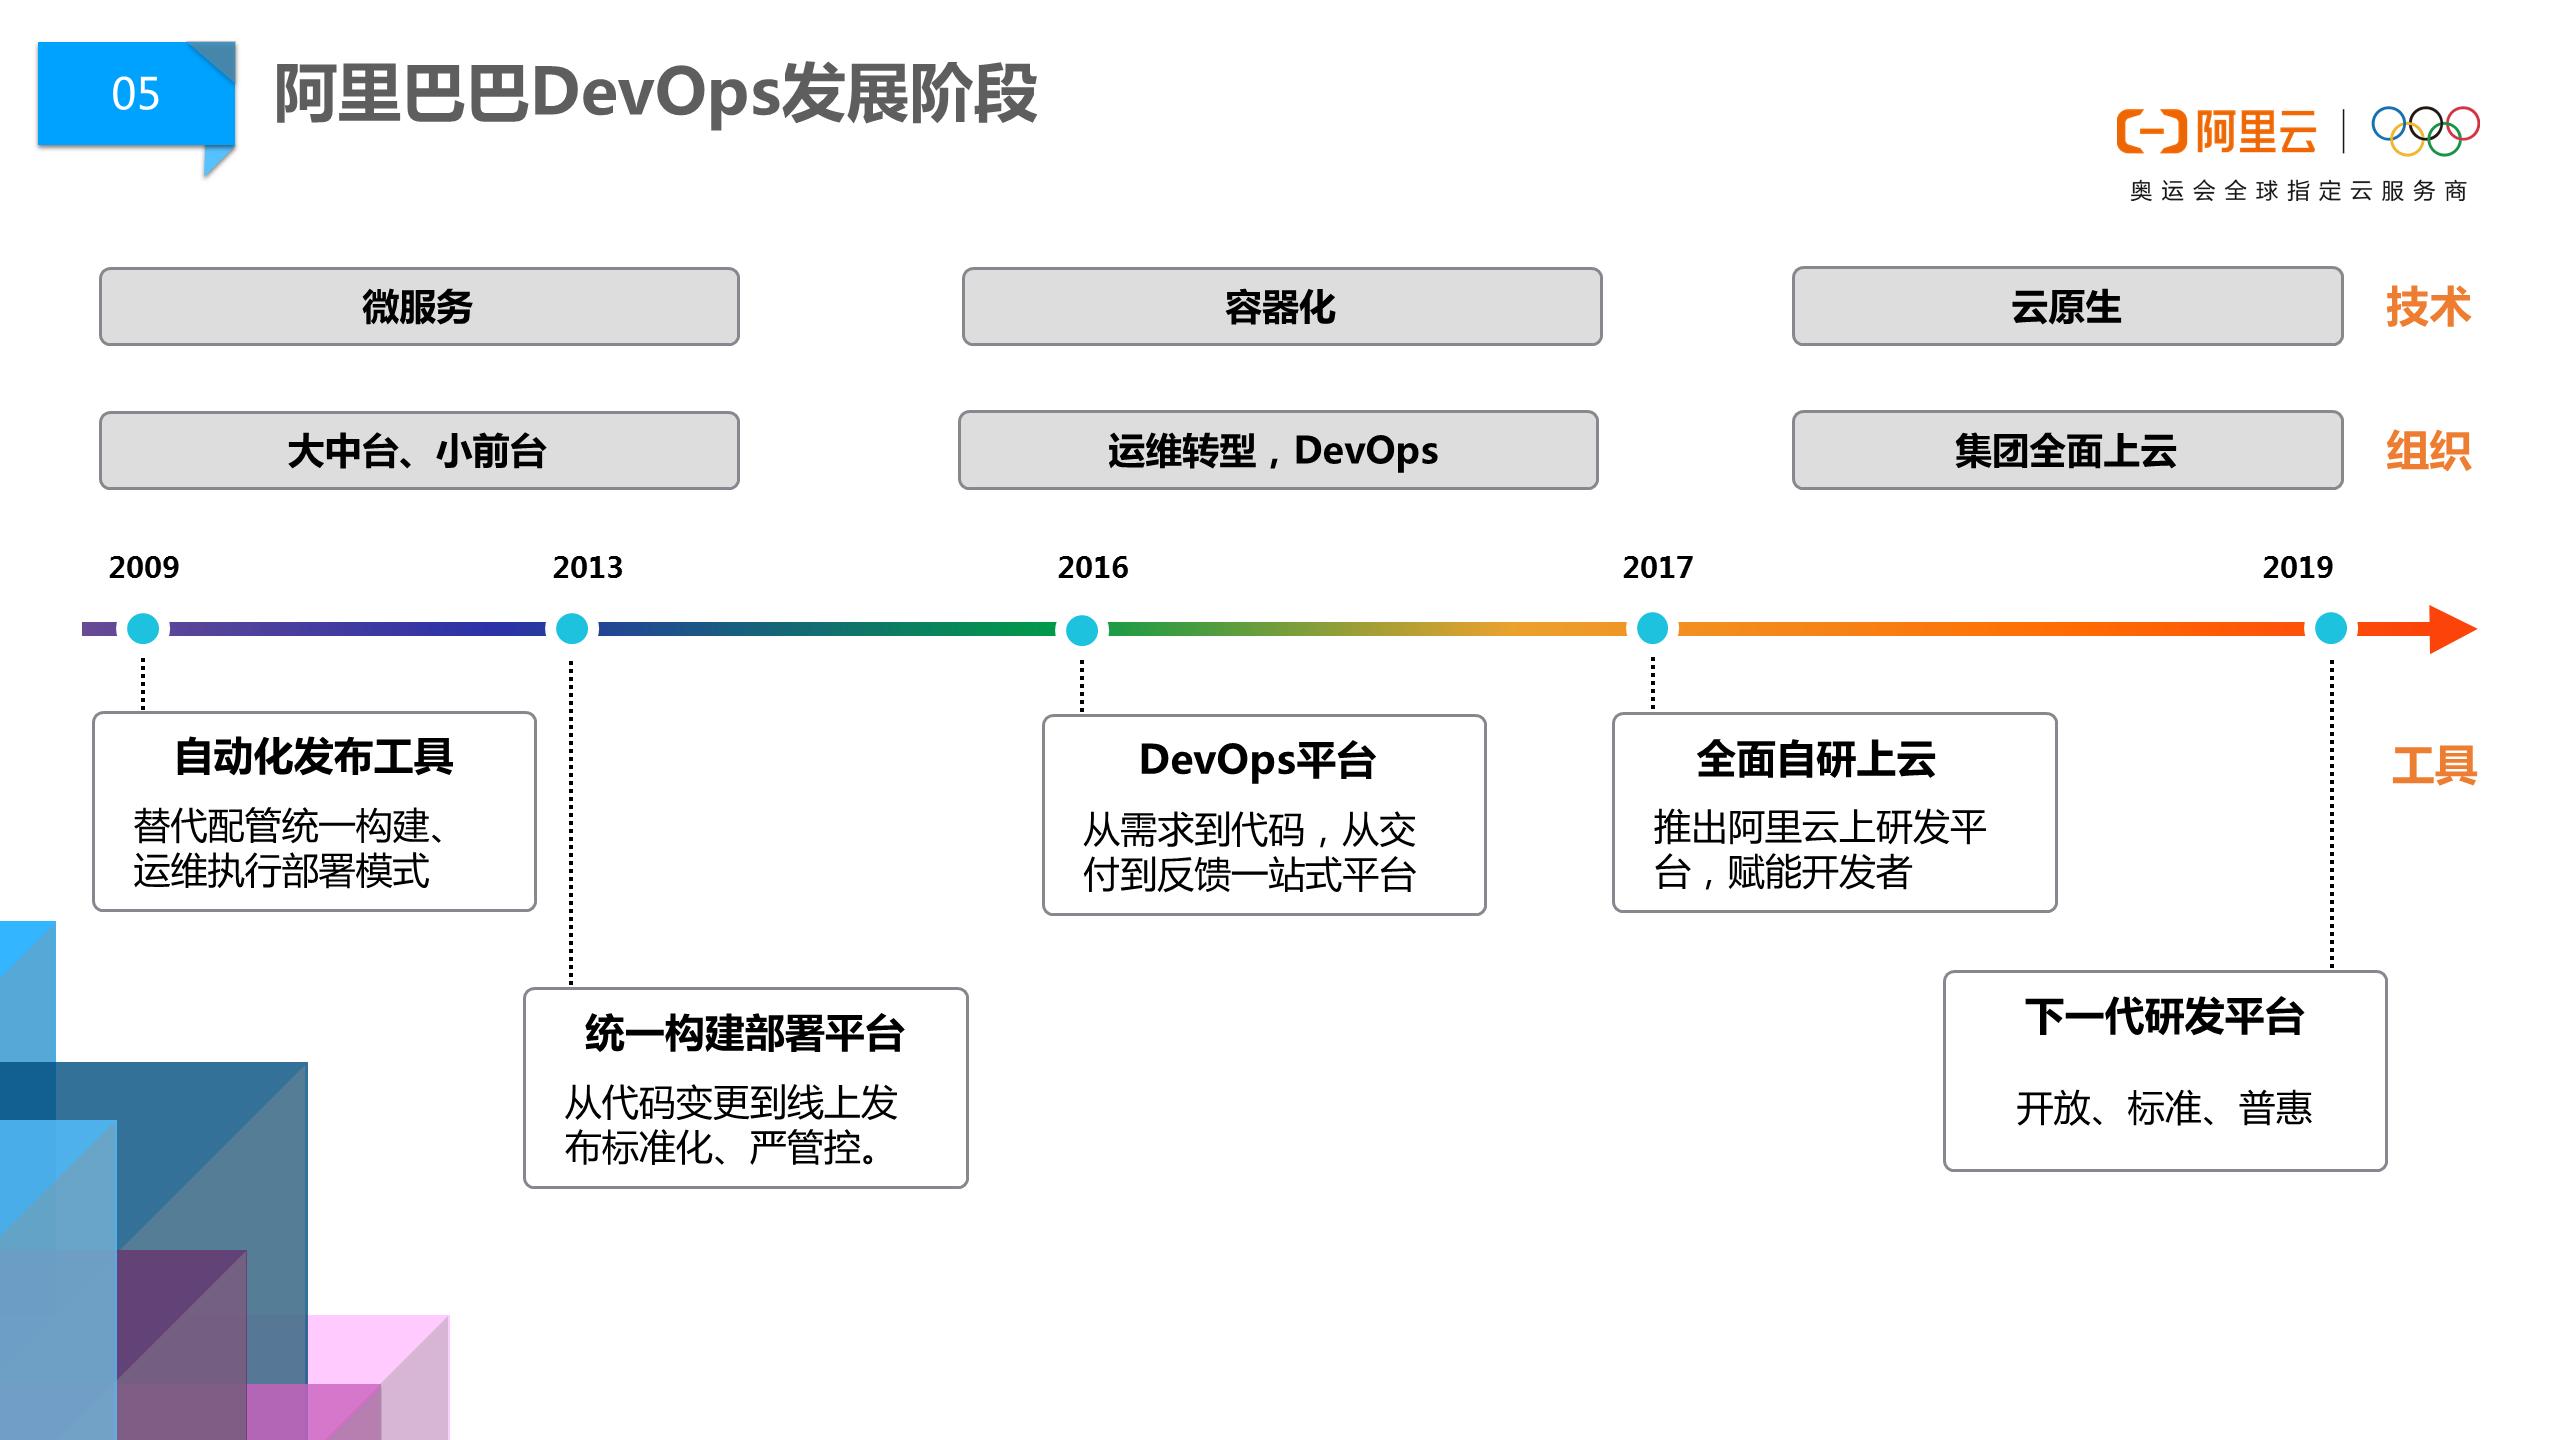 阿里巴巴DevOps文化浅谈03.png